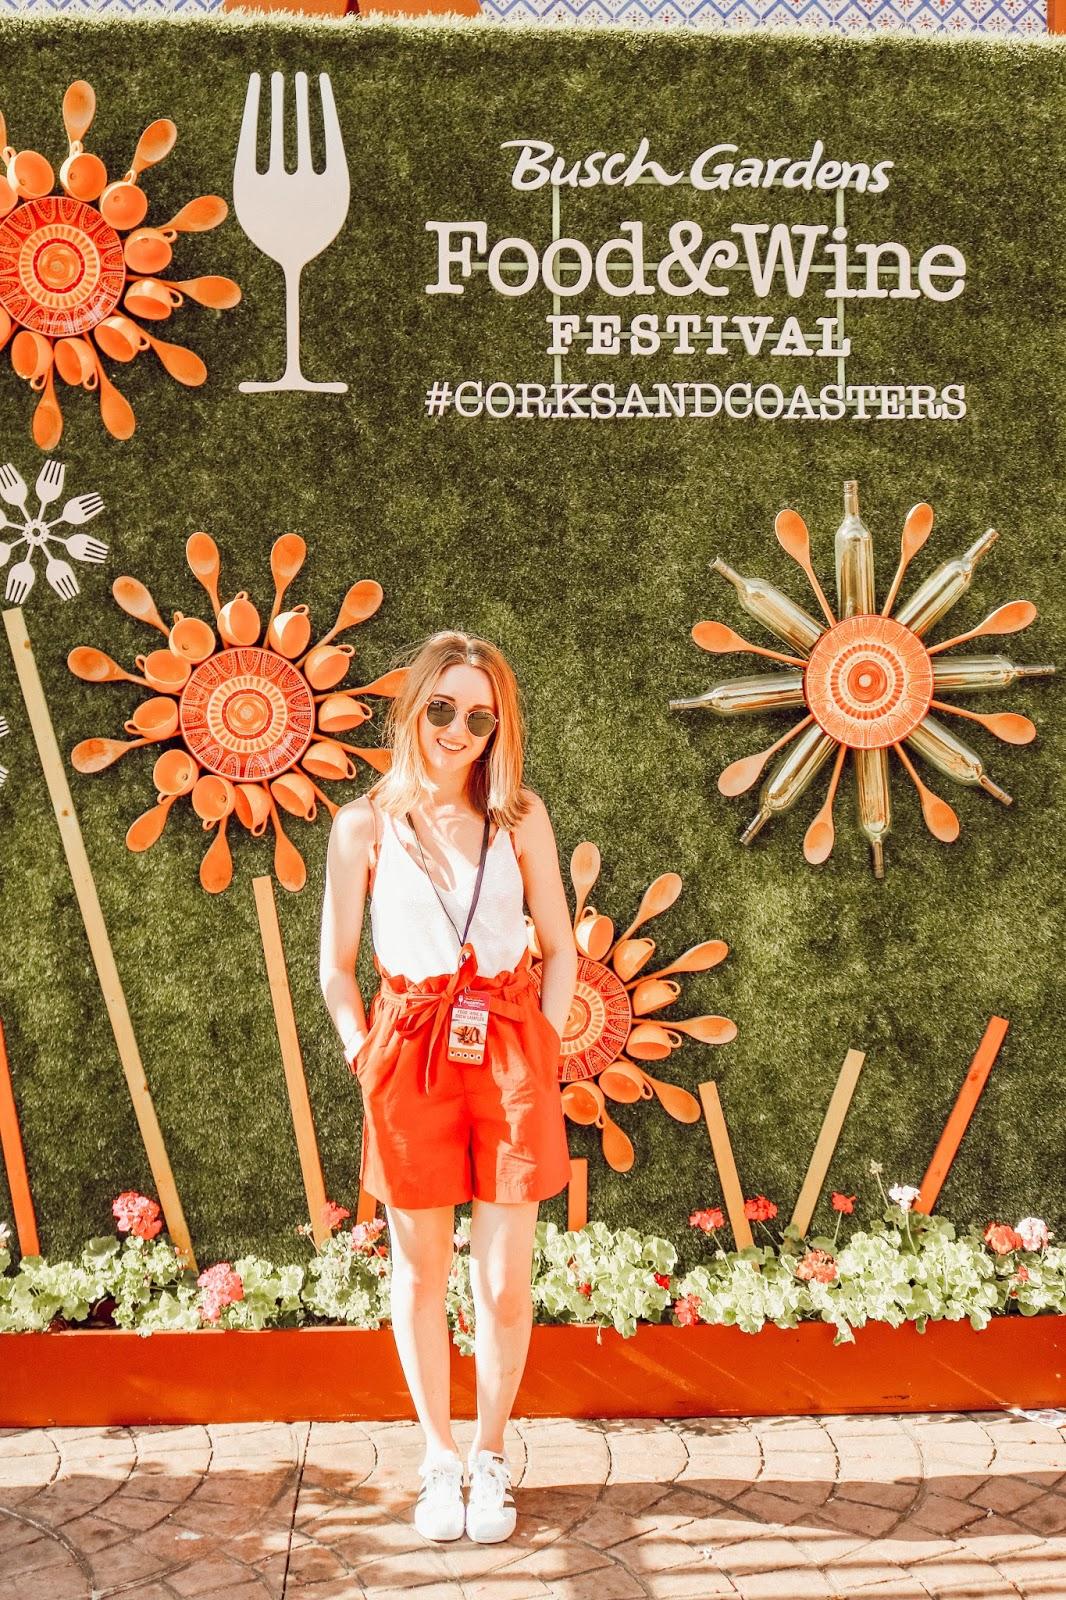 Busch Gardens Food & Wine Festival | Lucky Day